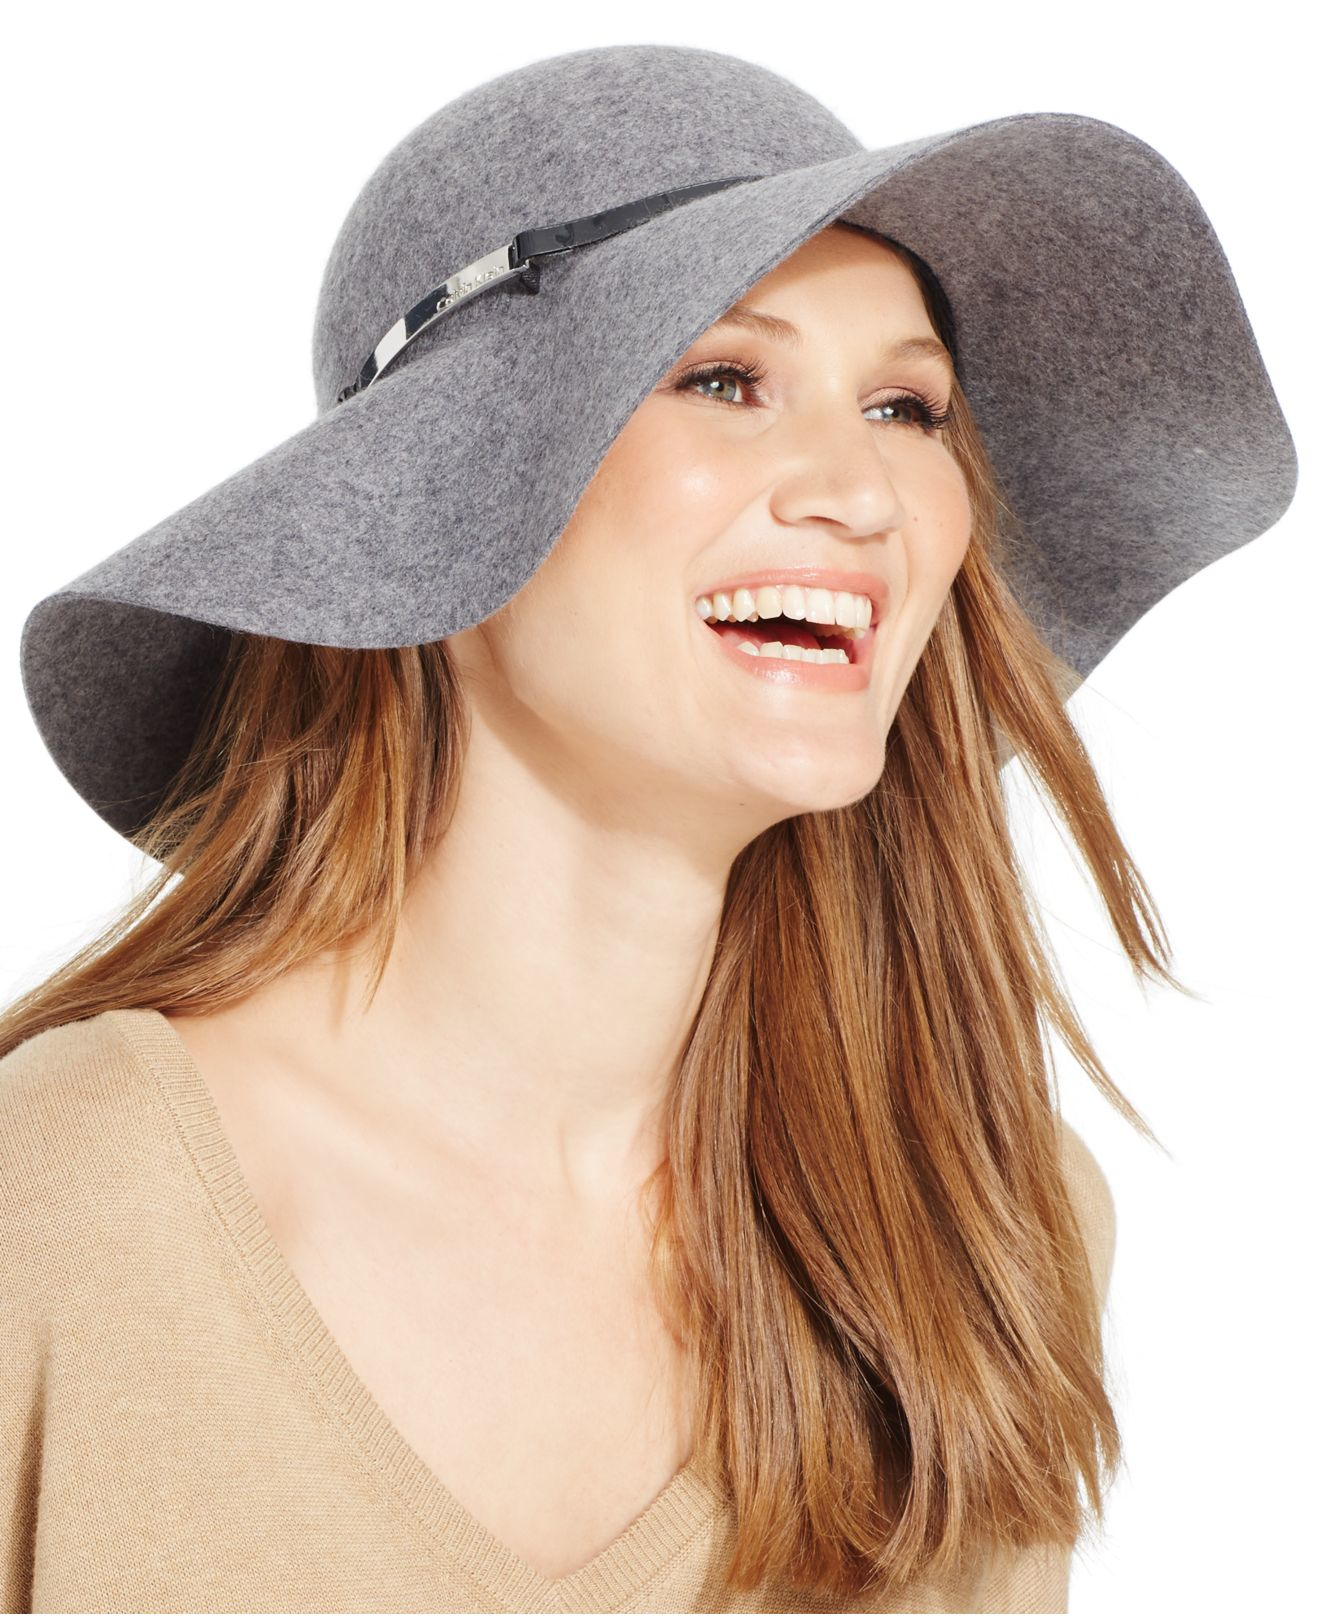 Lyst - Calvin Klein Wool Felt Floppy Hat in Gray 325932717ff